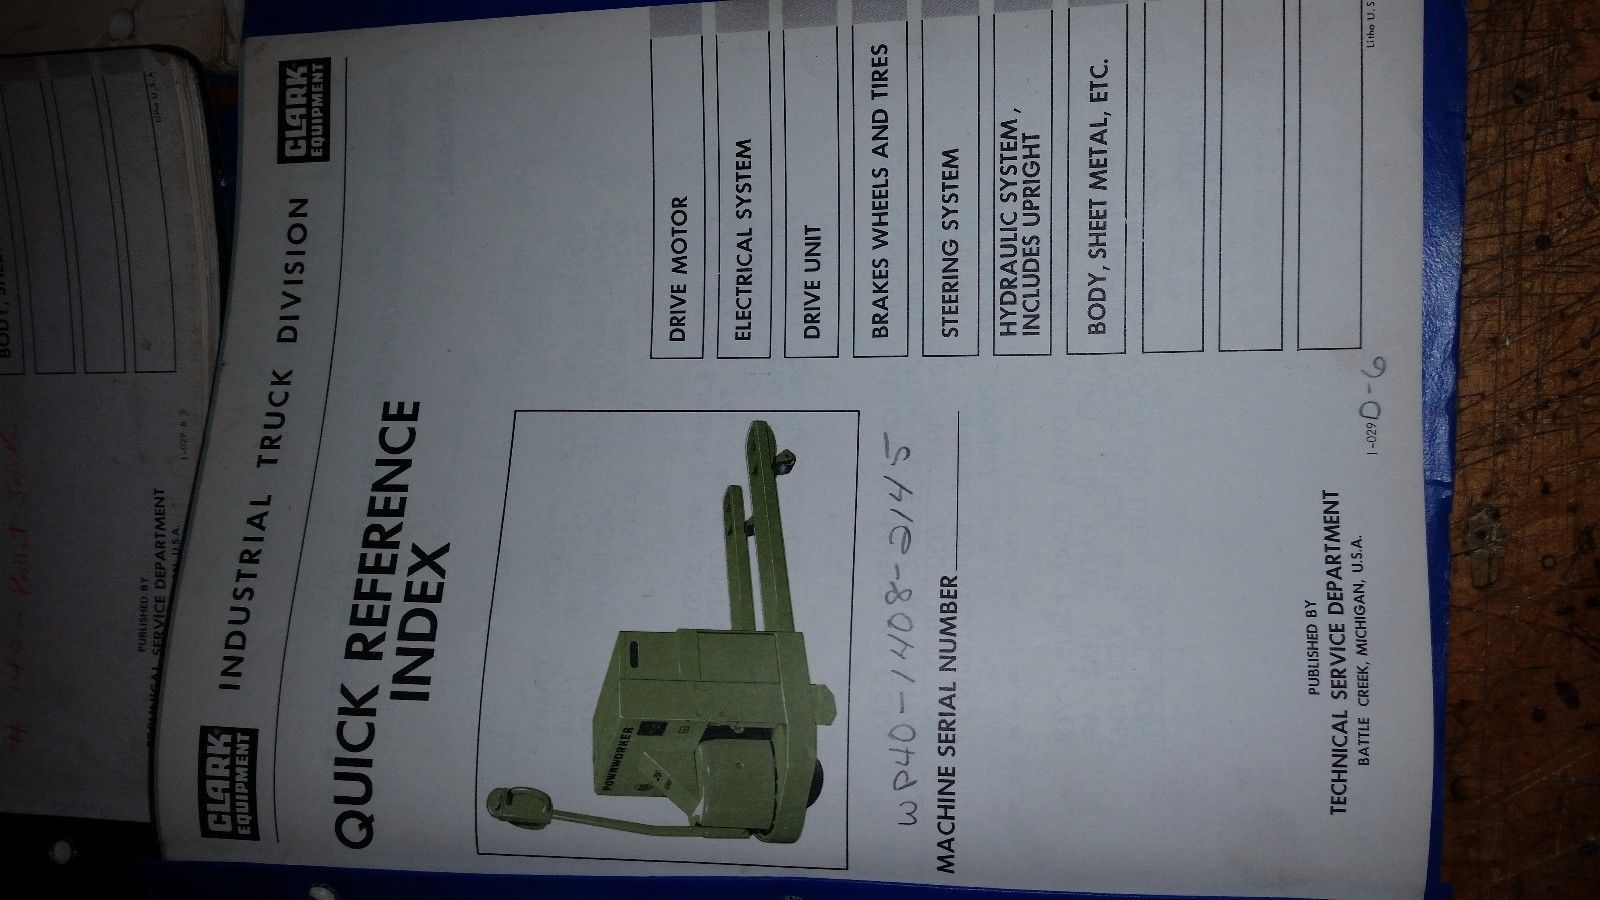 Clark electric pallet jack powrworker quick reference index maintenance manuals